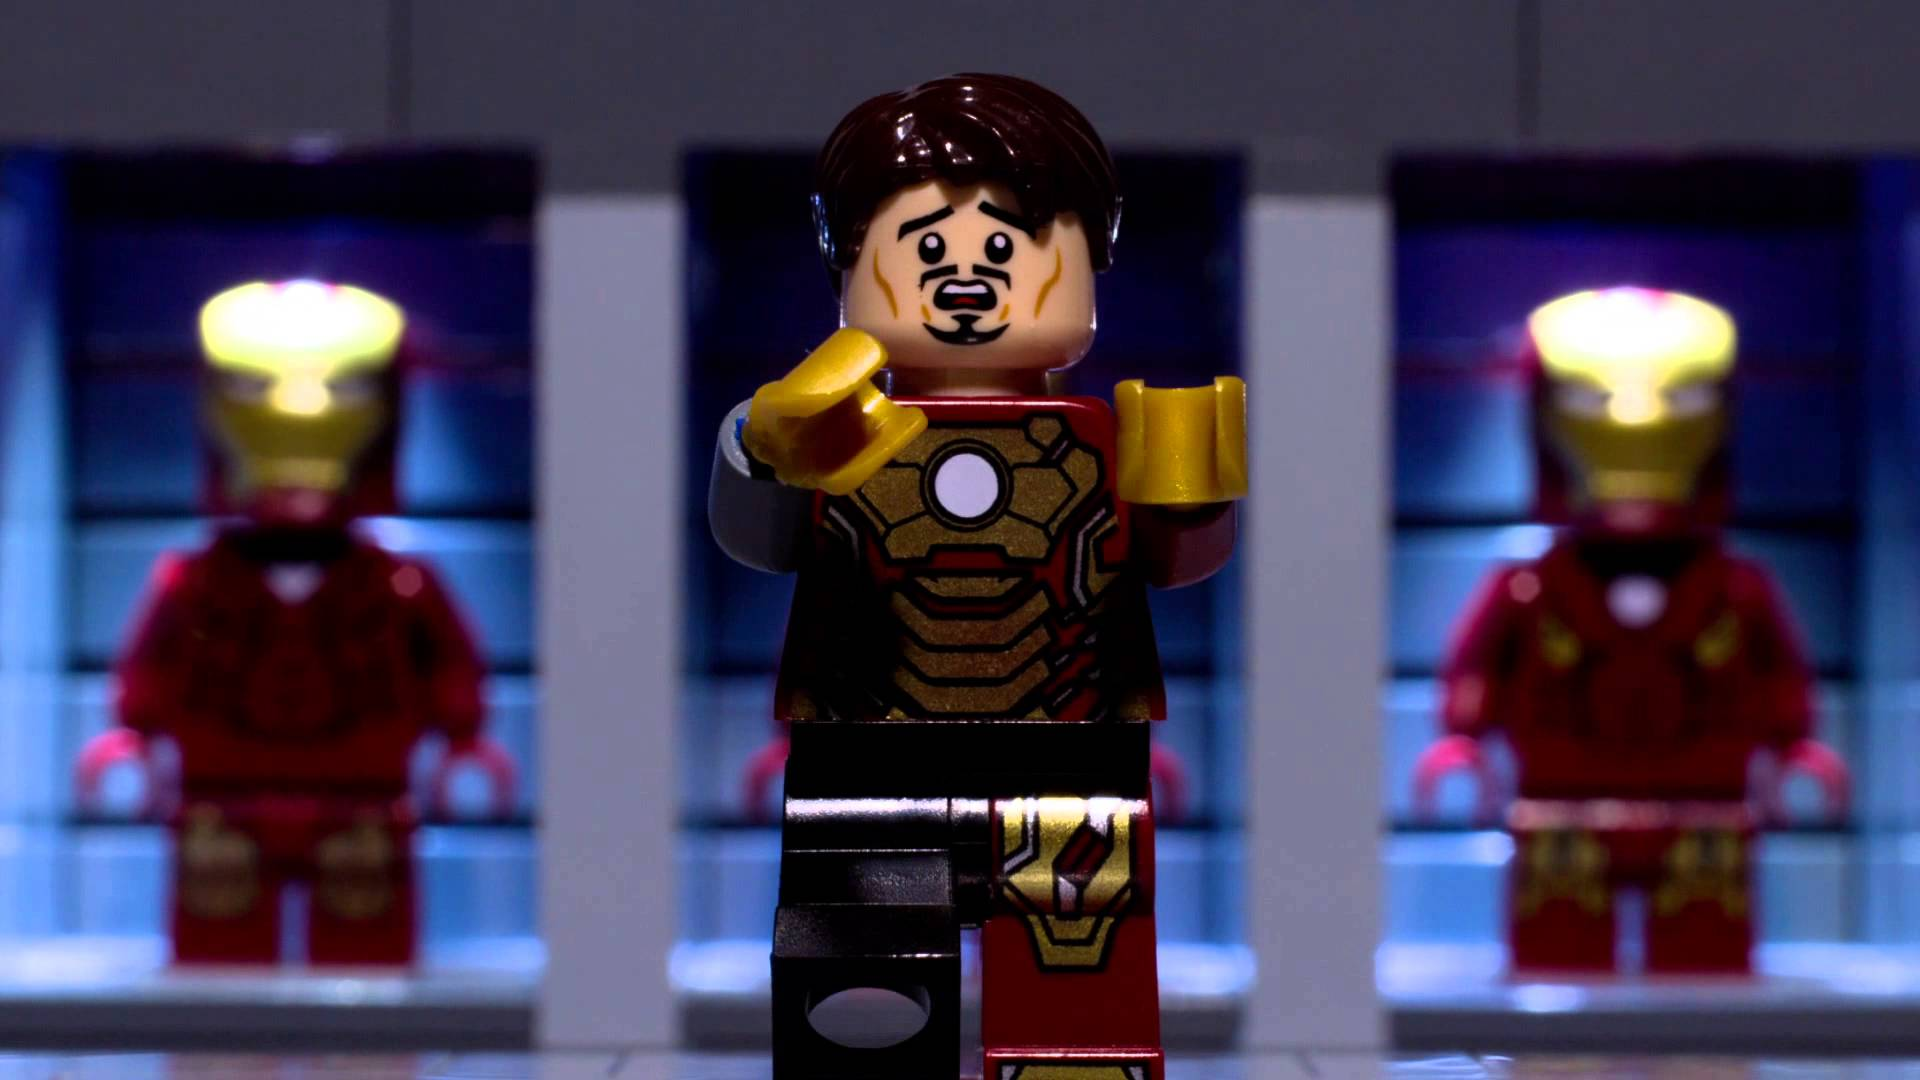 Videos 3 Lego Iron De Man Juguetes K1lFcTJ